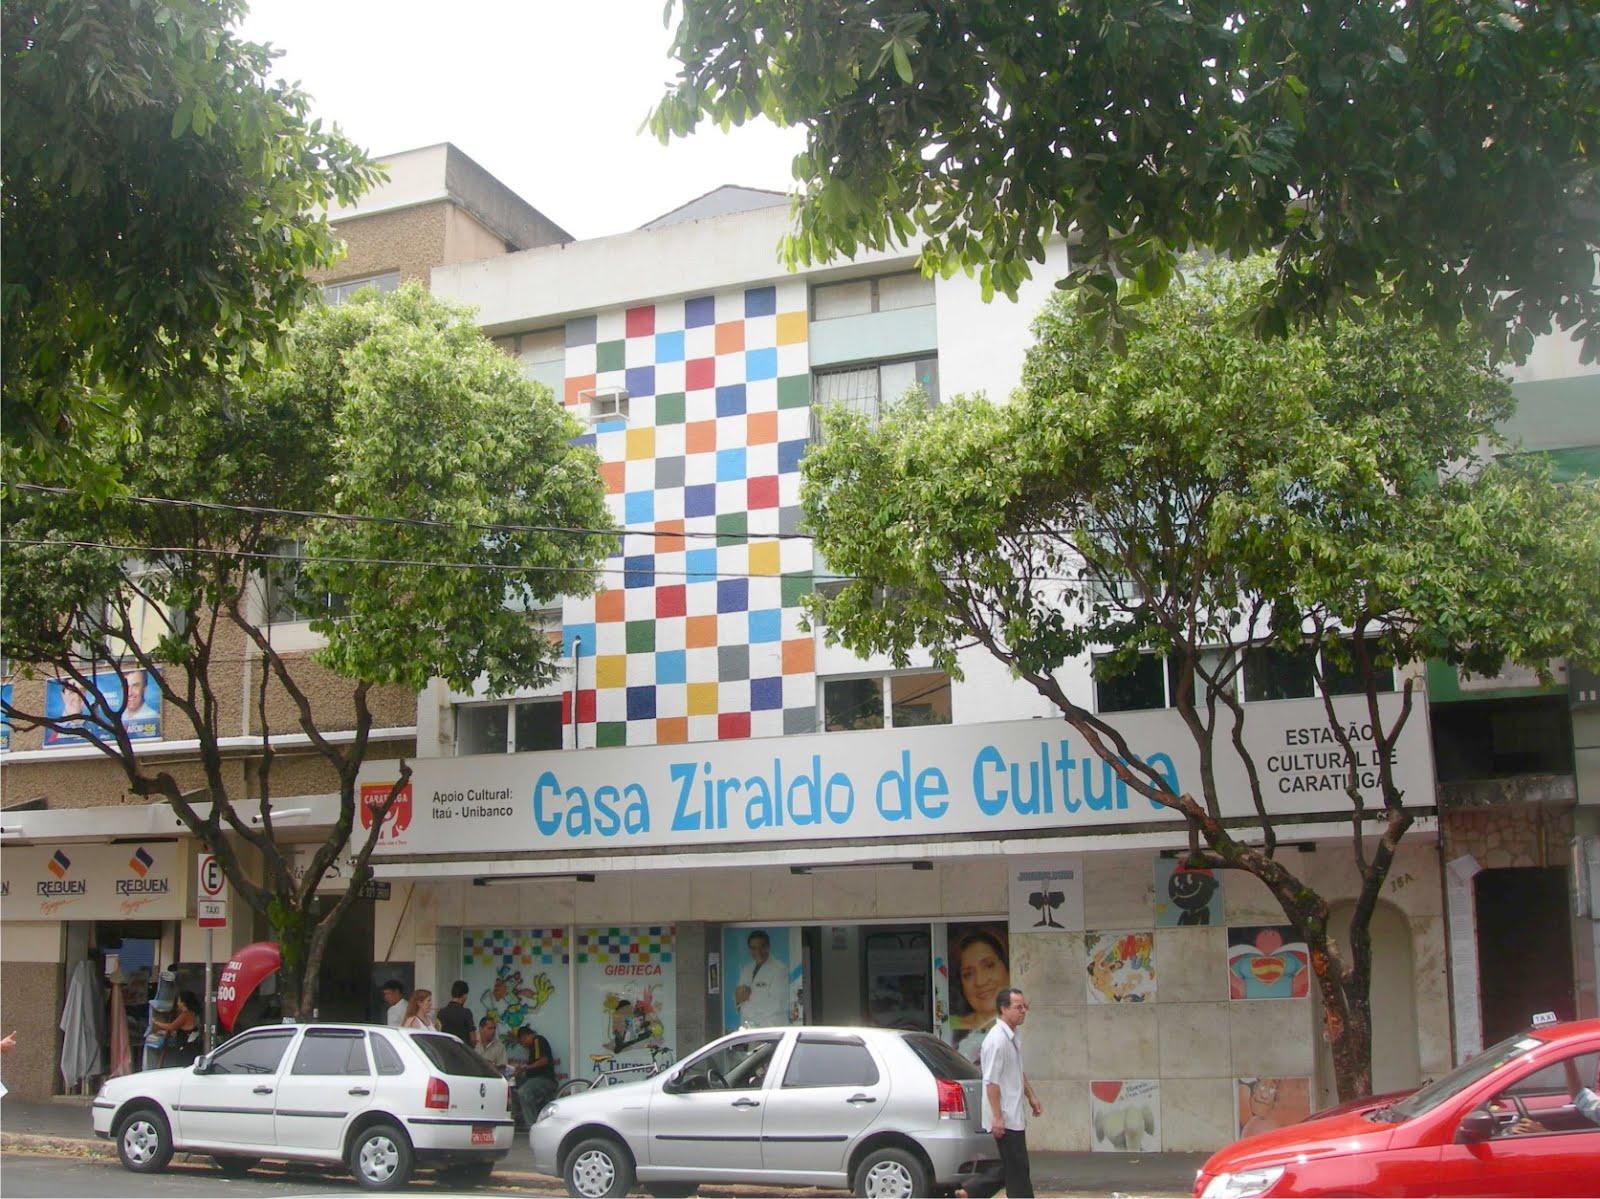 Casa Ziraldo de Cultura